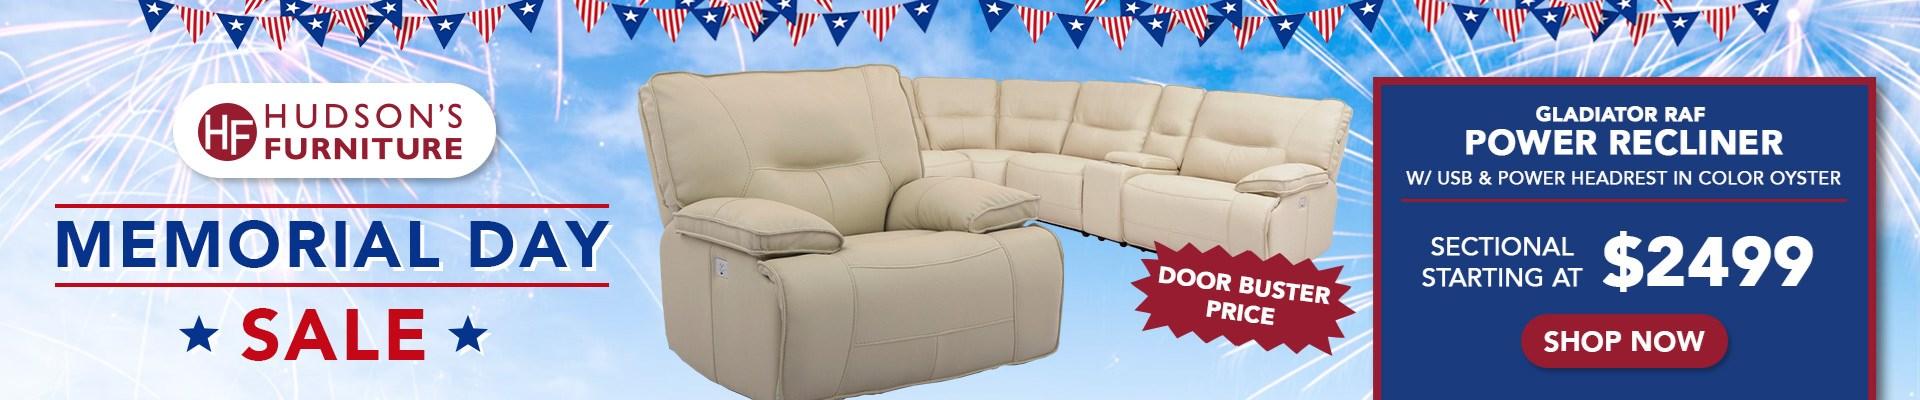 Gladiator Sofa Hudson's Furniture Memorial Day Sale